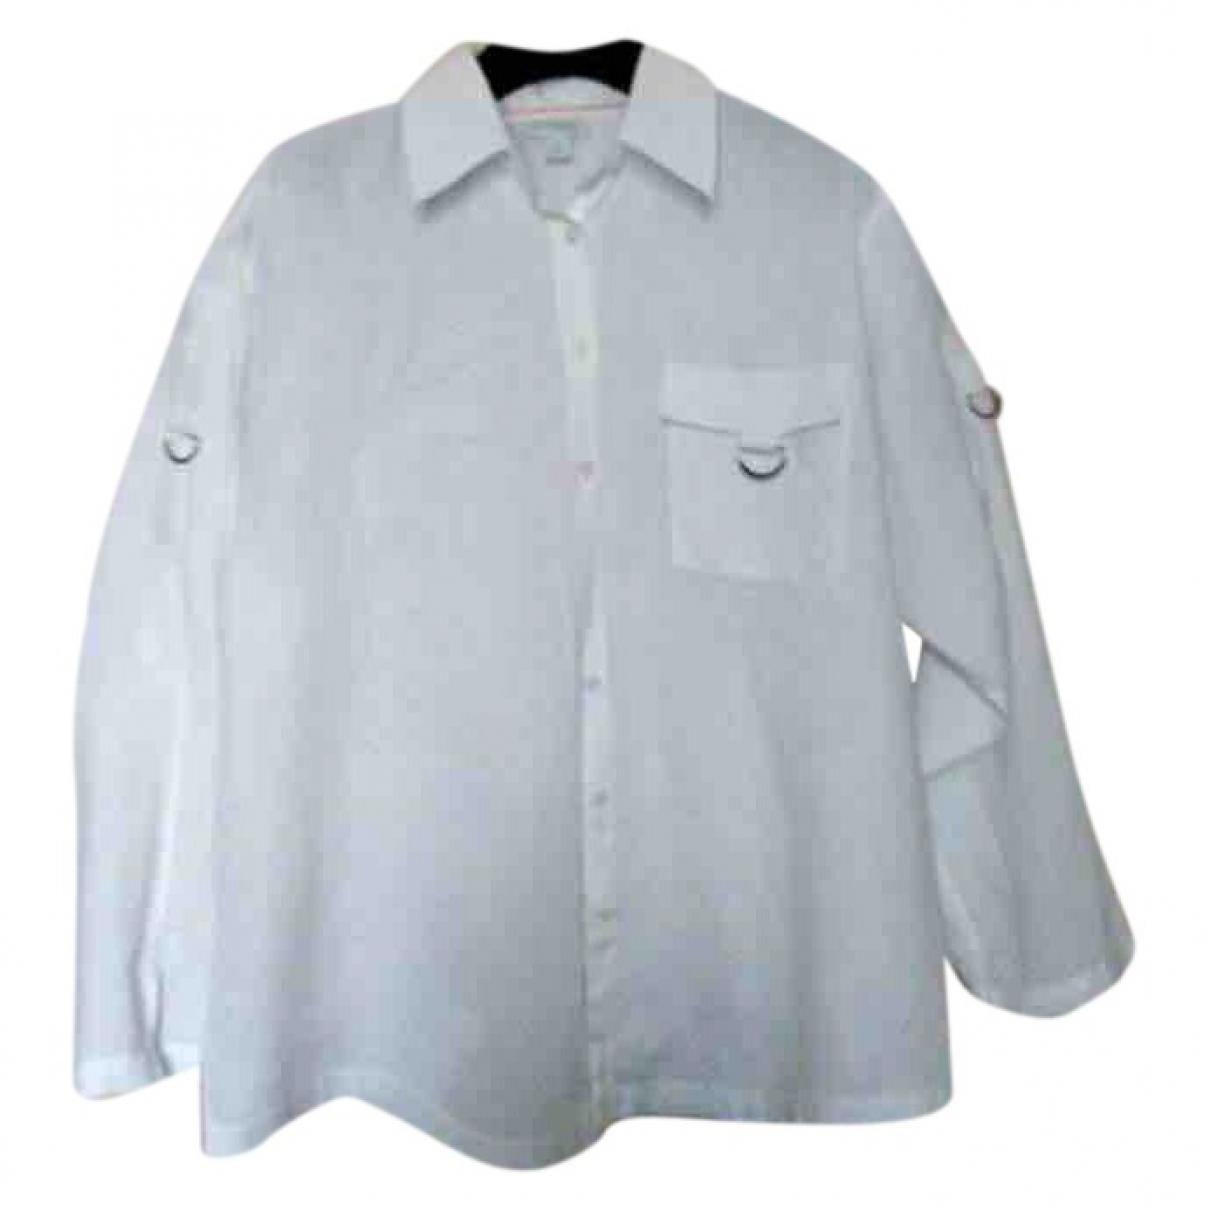 Camisa Oversize de Lino Non Signe / Unsigned